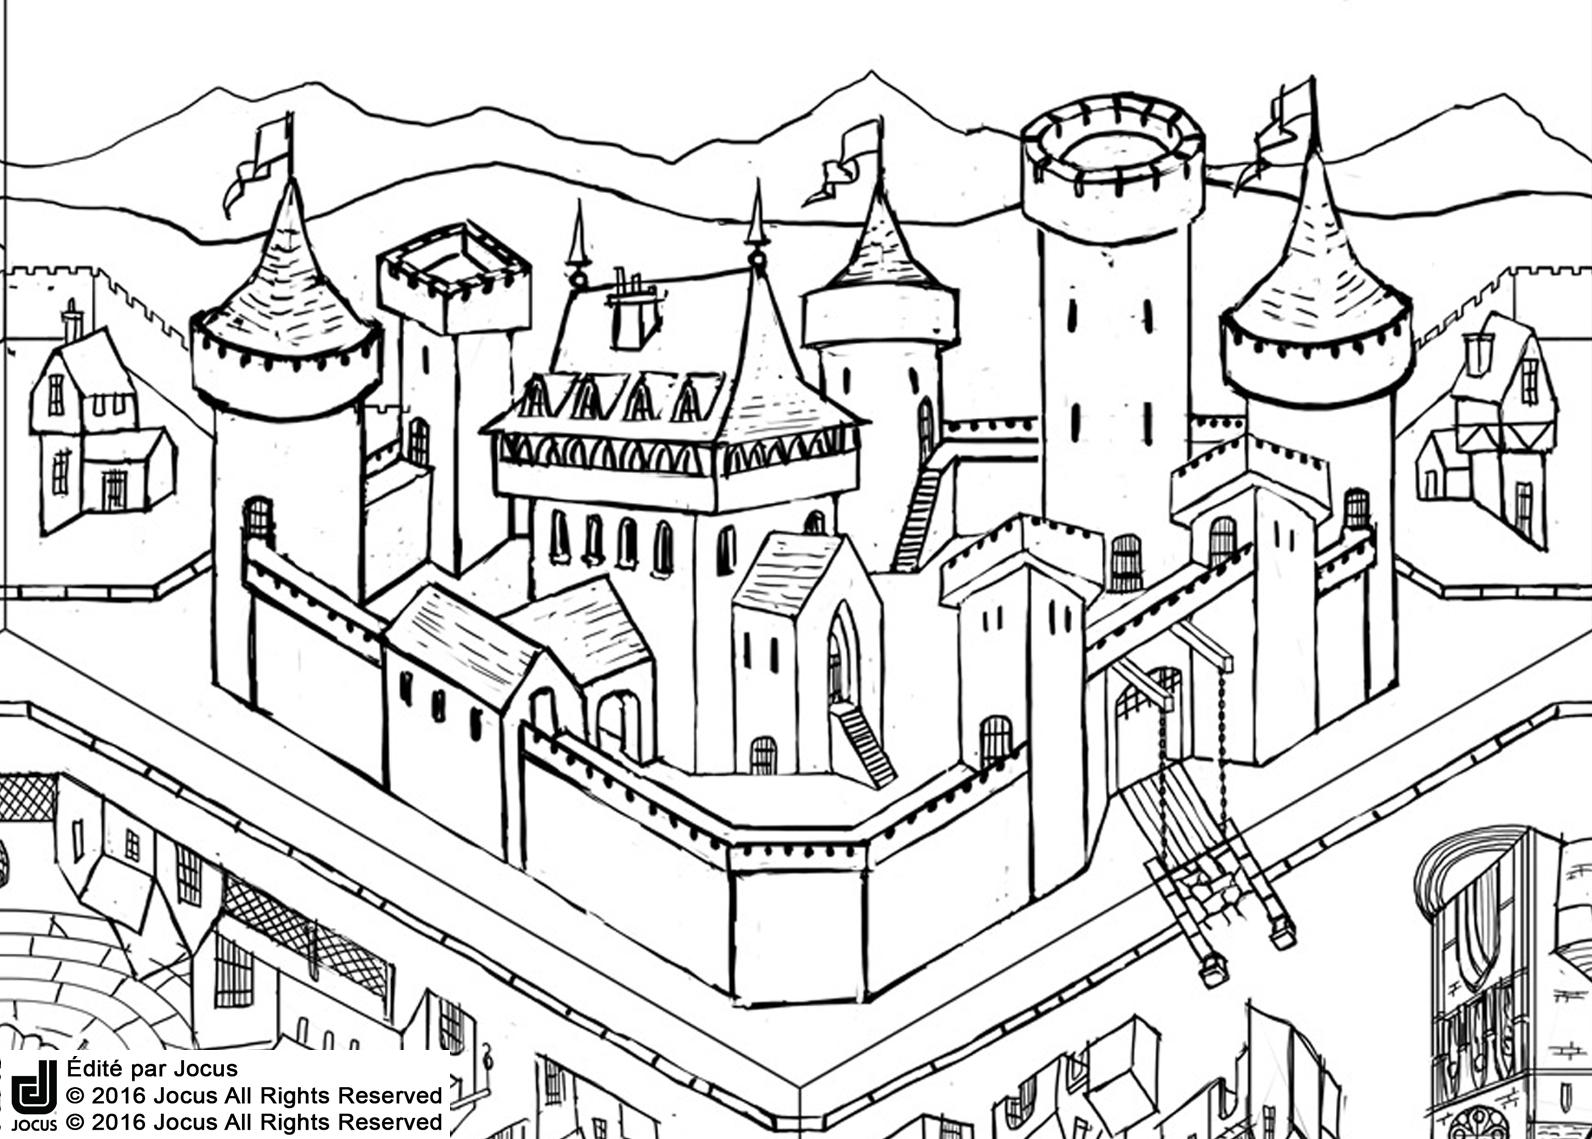 Chateau Croquis